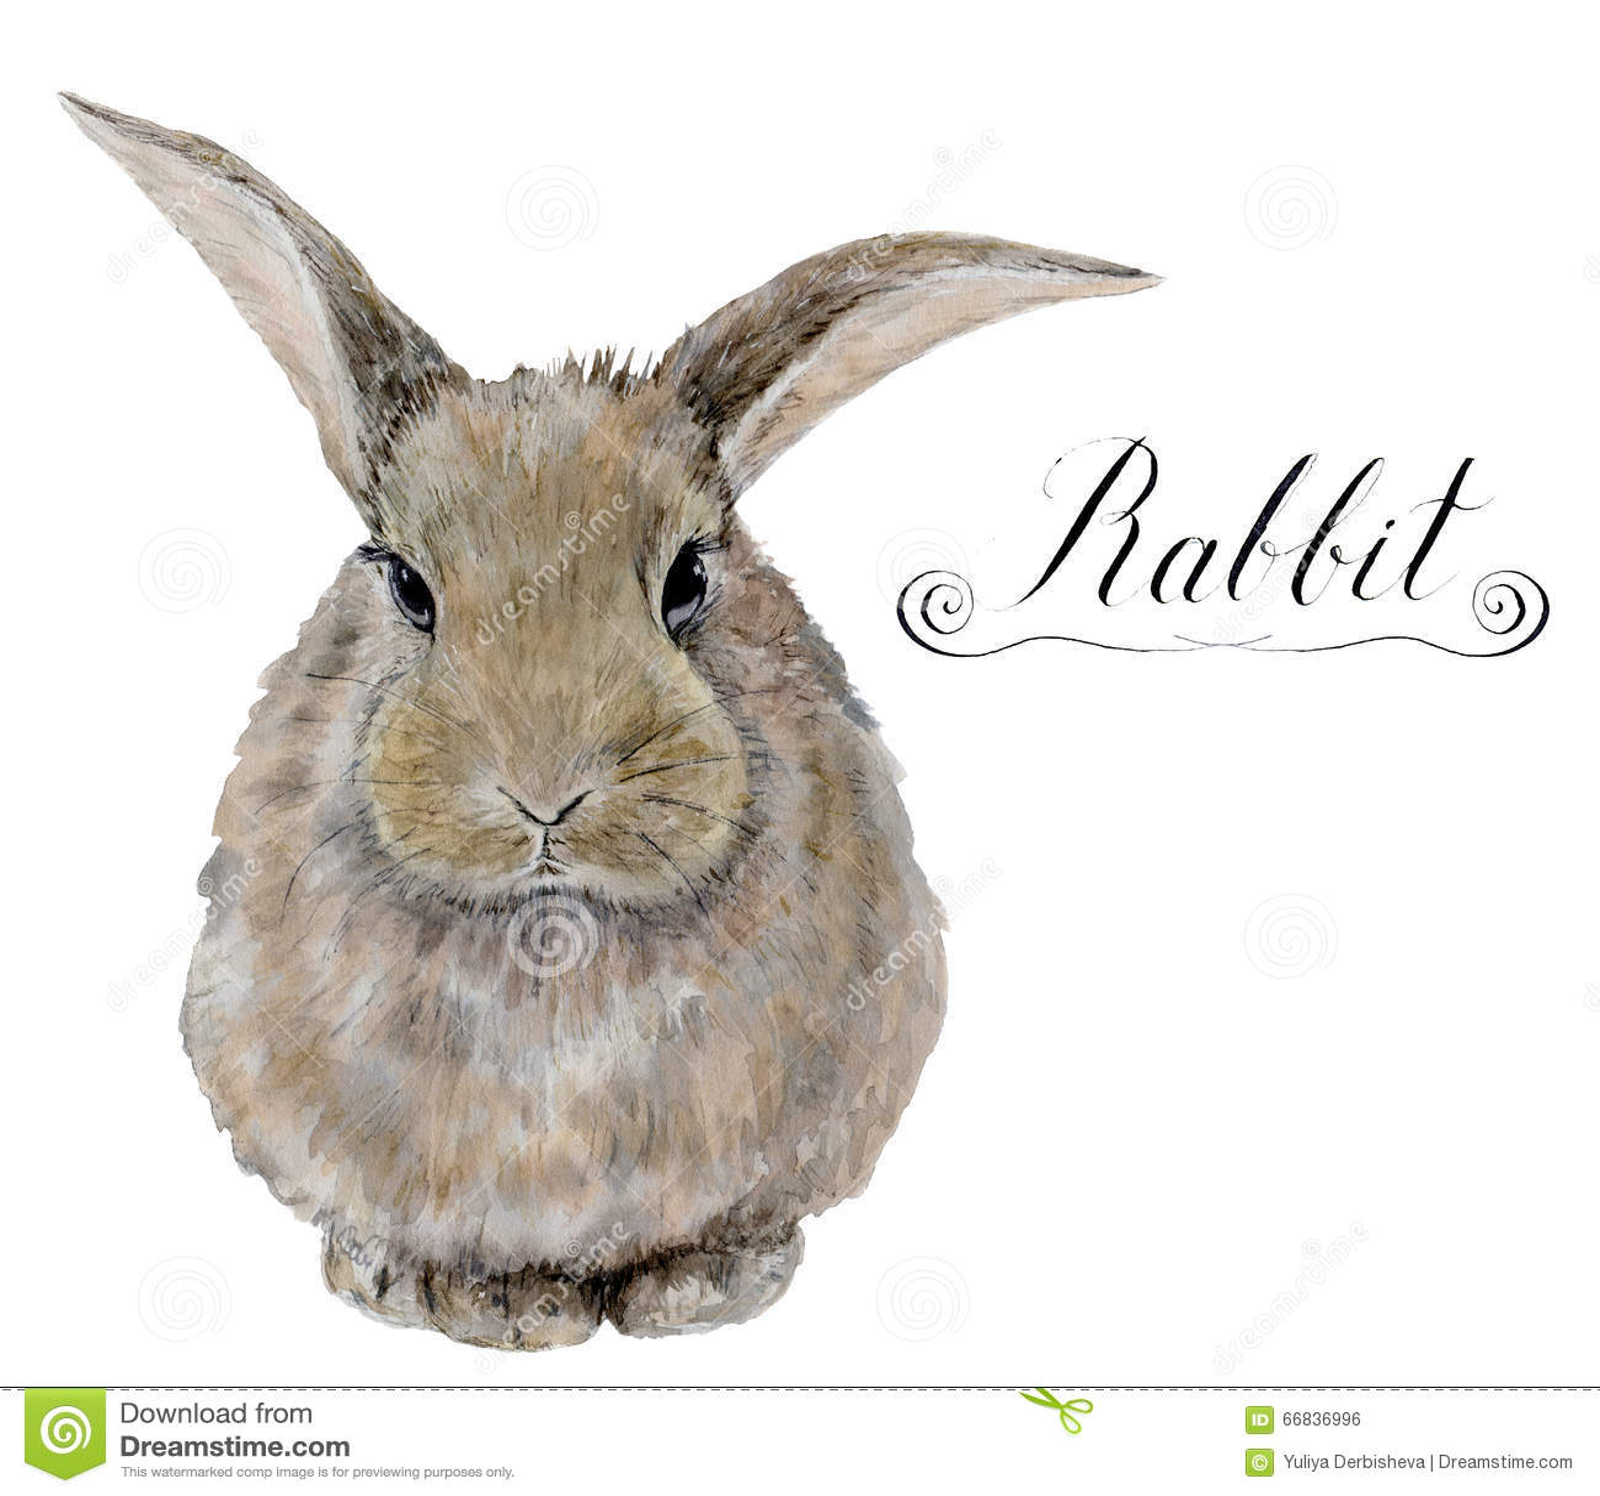 Realistic rabbit illustration - photo#5